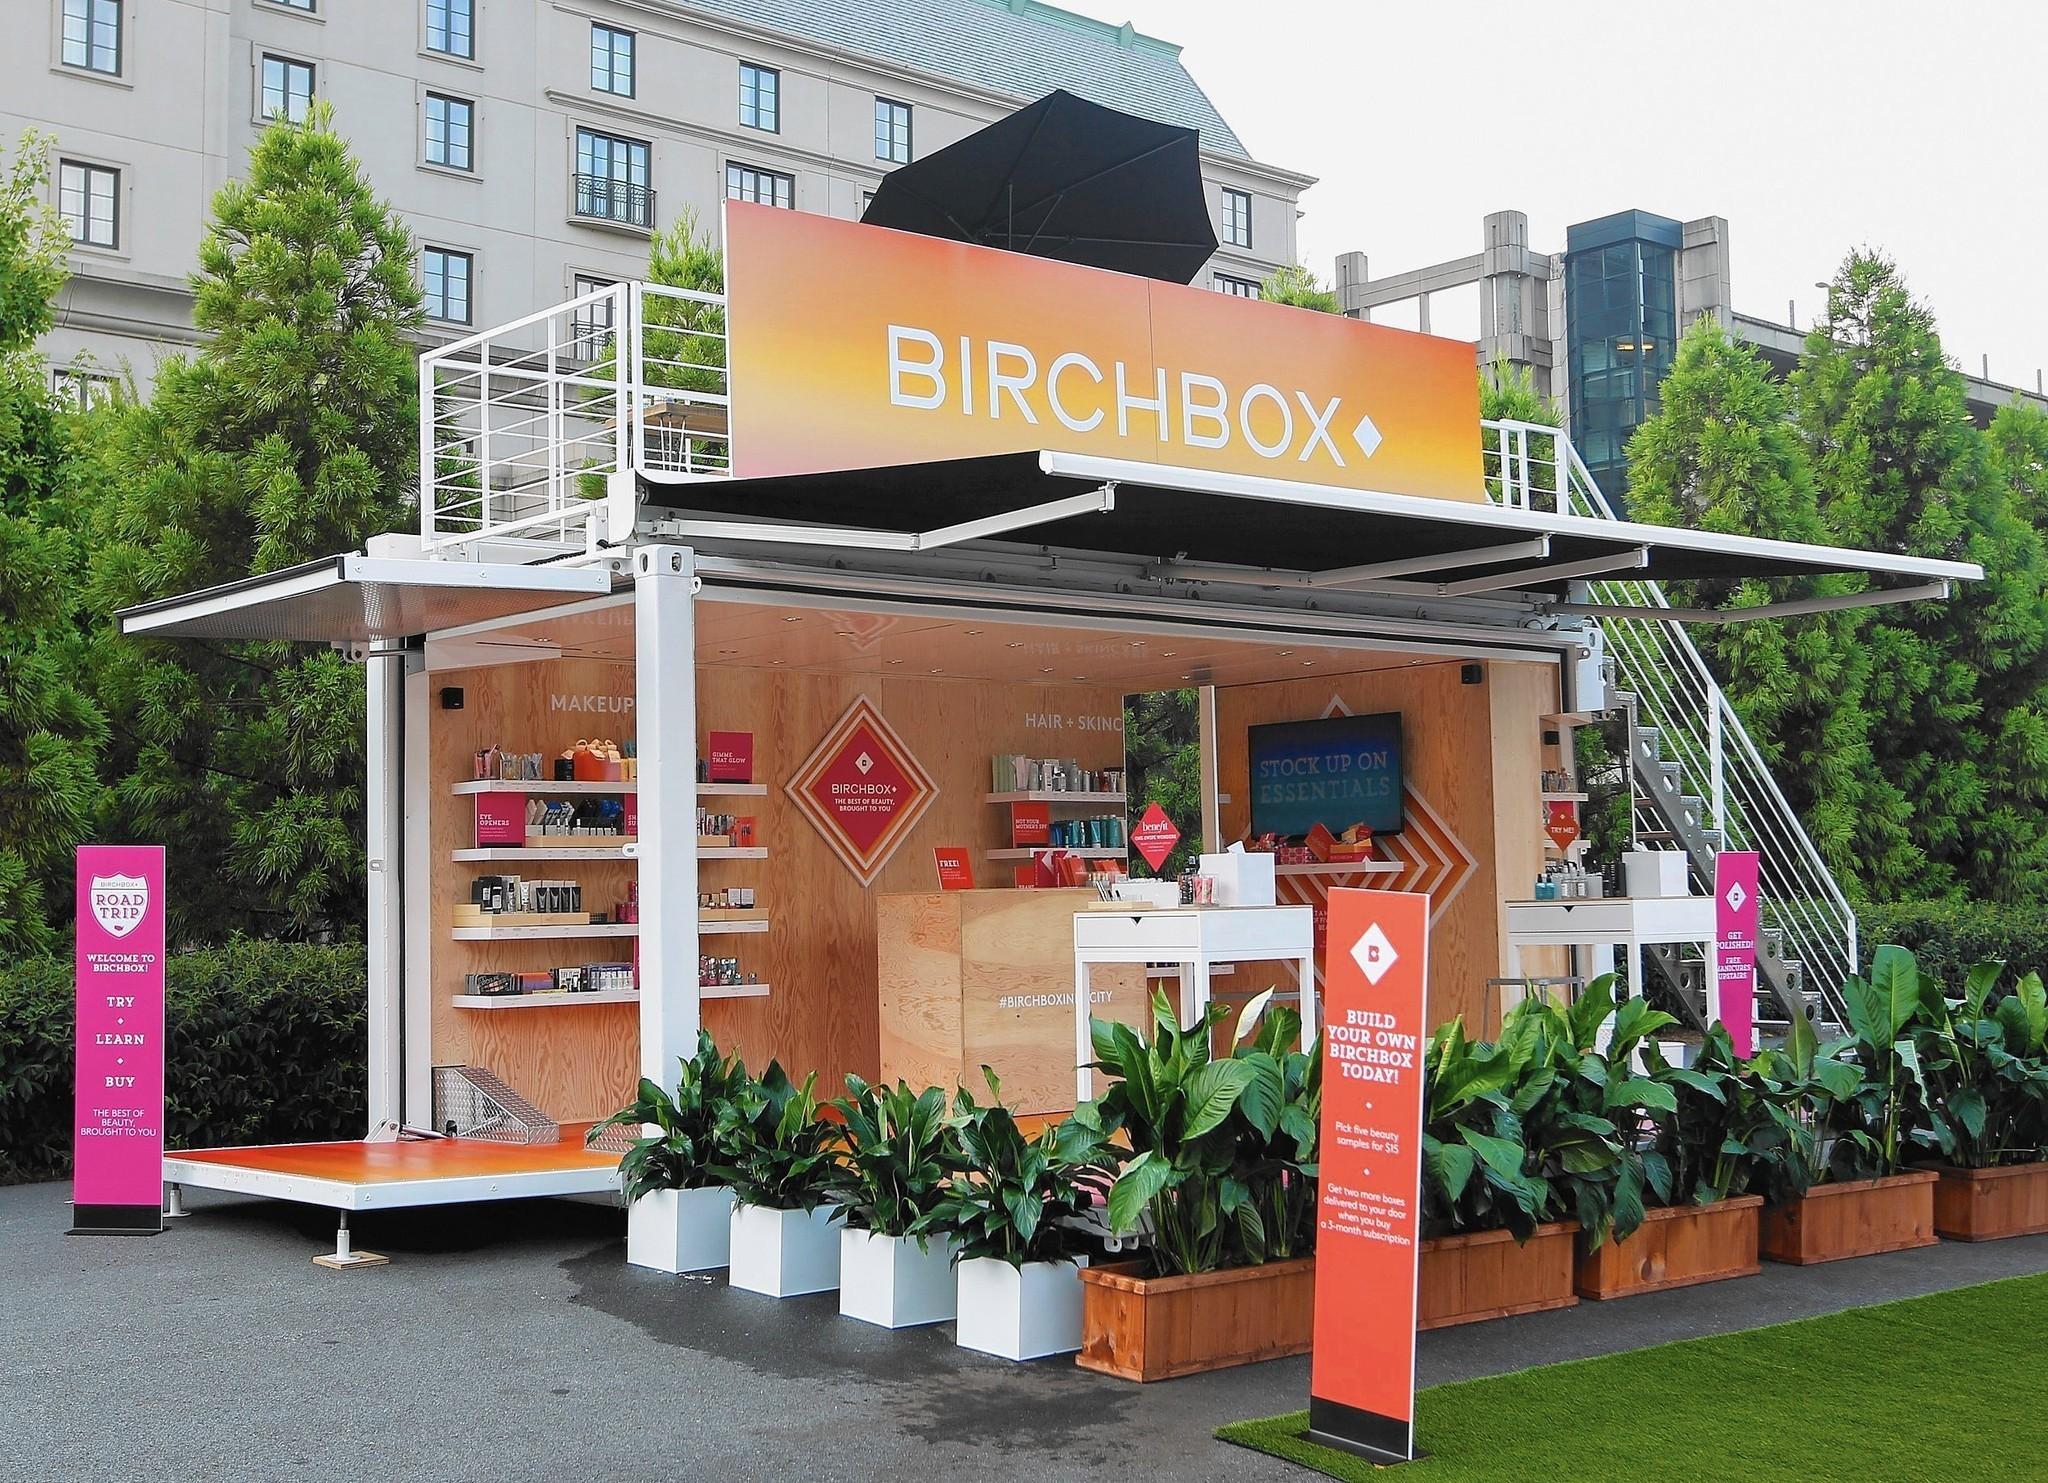 Birchbox popup